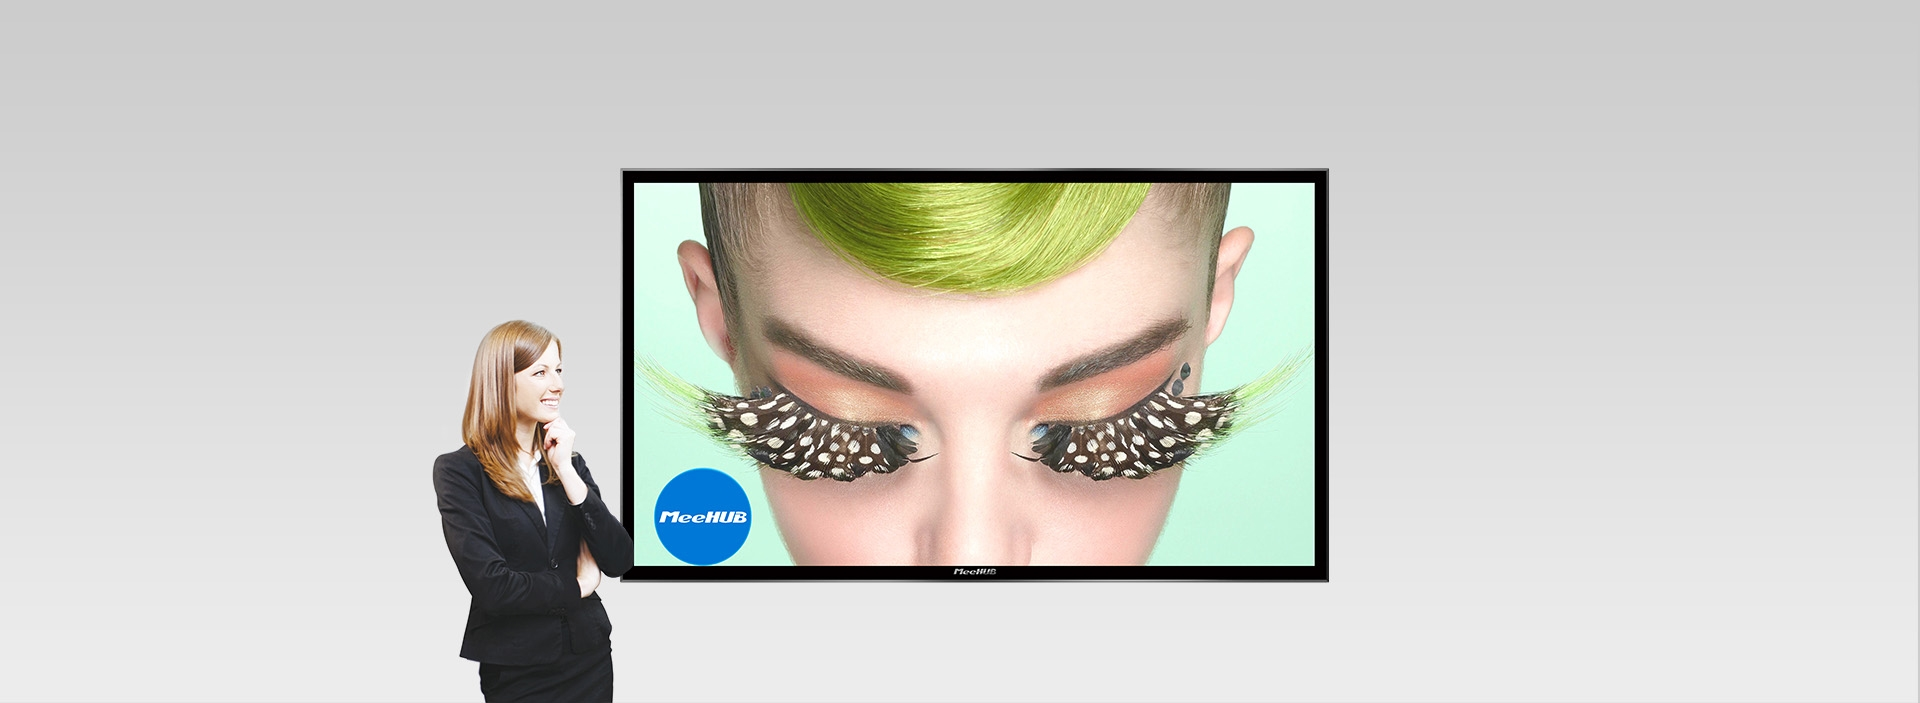 MeeHUB 超级会议平板:原笔迹书写、无线传屏、视频会议、多屏互动、随时批注等特点,为您带来大屏智能互动新体验!